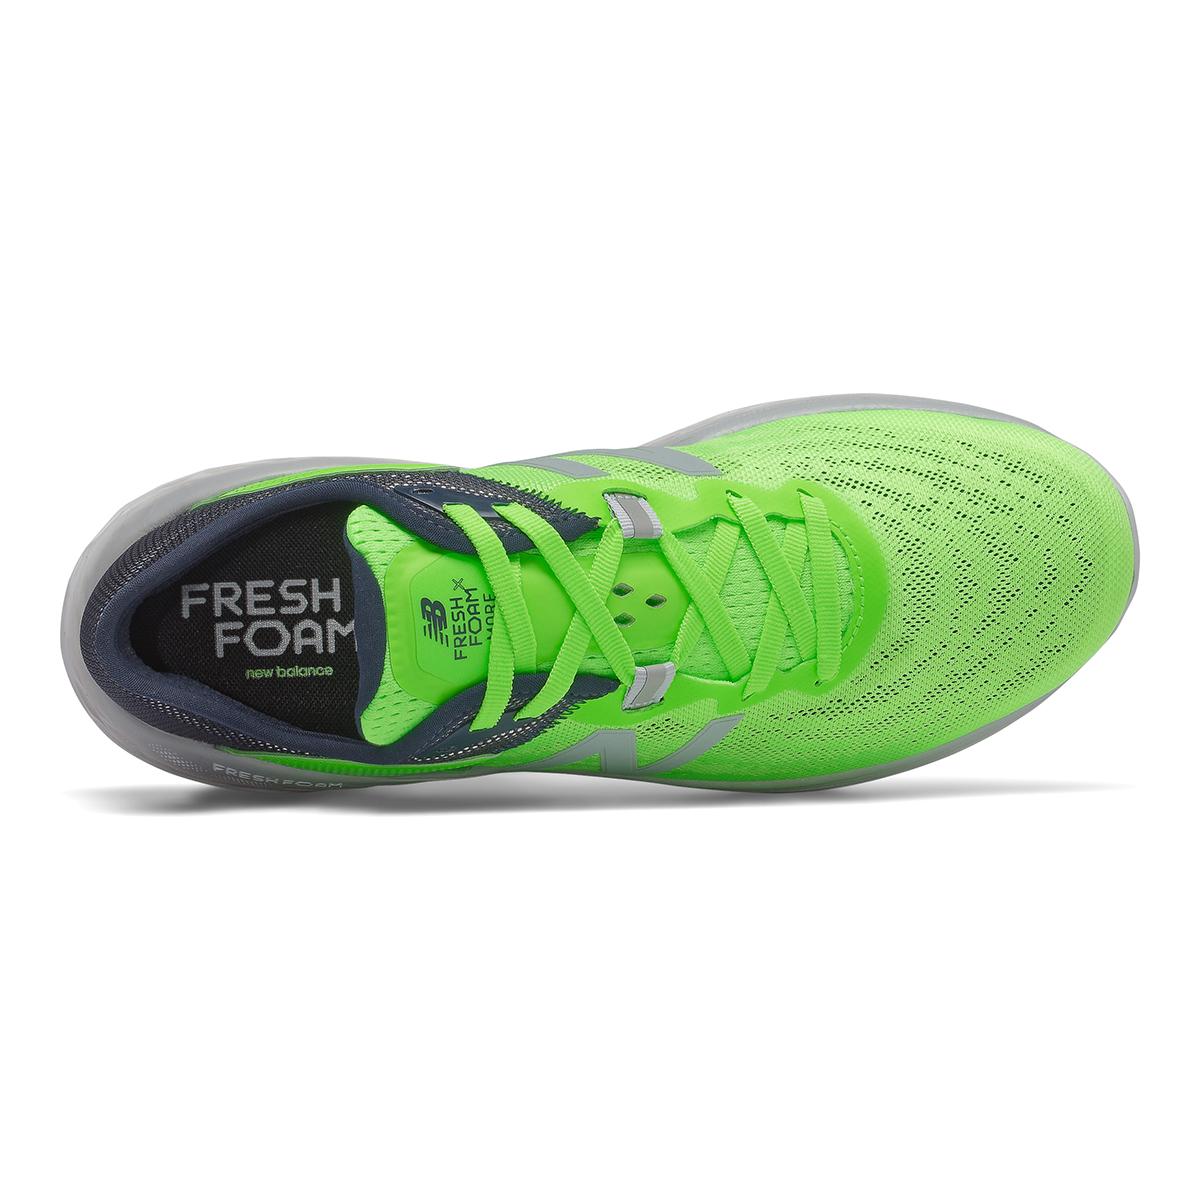 Men's New Balance Fresh Foam More V2 Running Shoe - Color: Energy Lime - Size: 7 - Width: Wide, Energy Lime, large, image 3